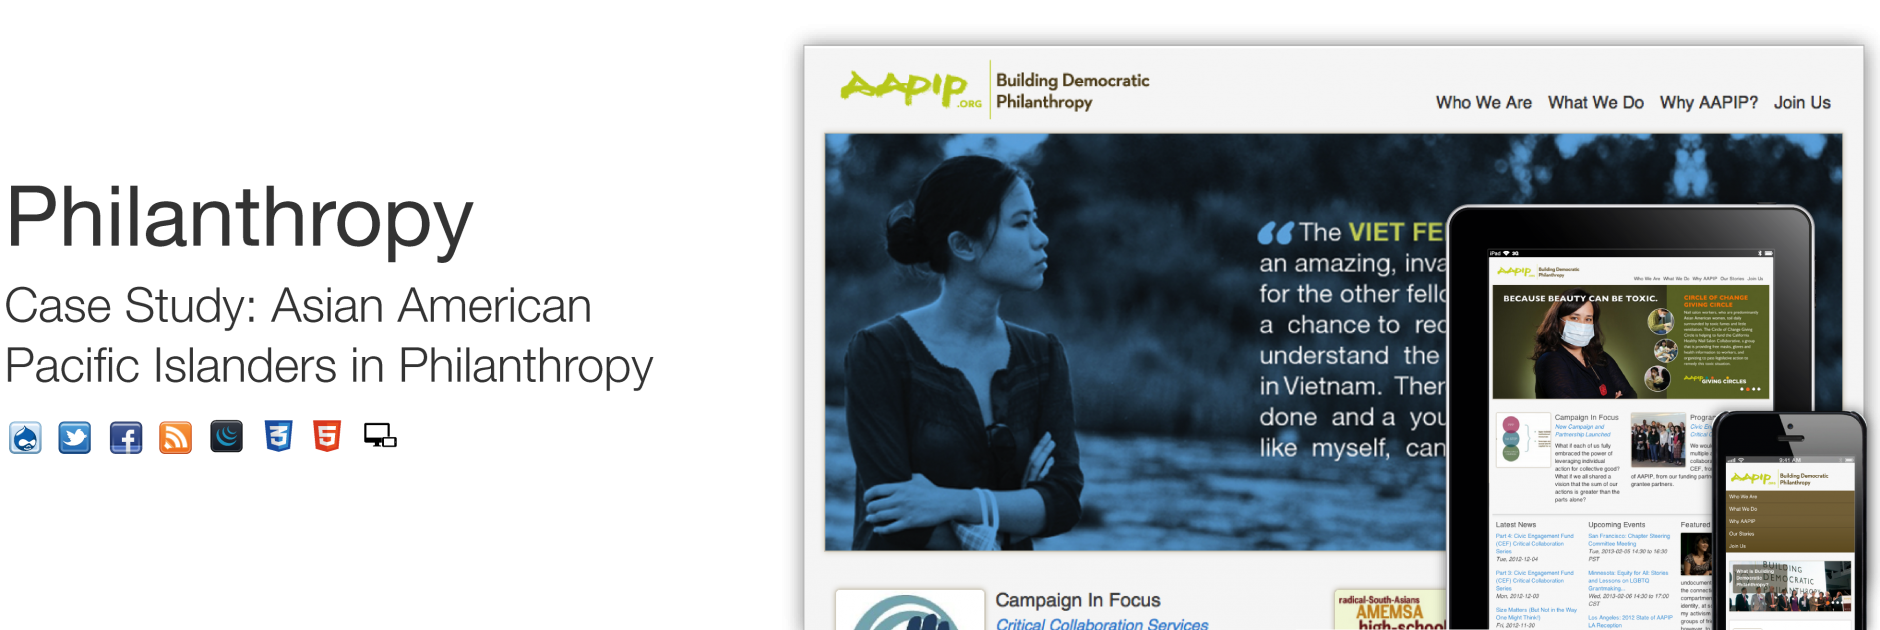 Philanthropy Case Study